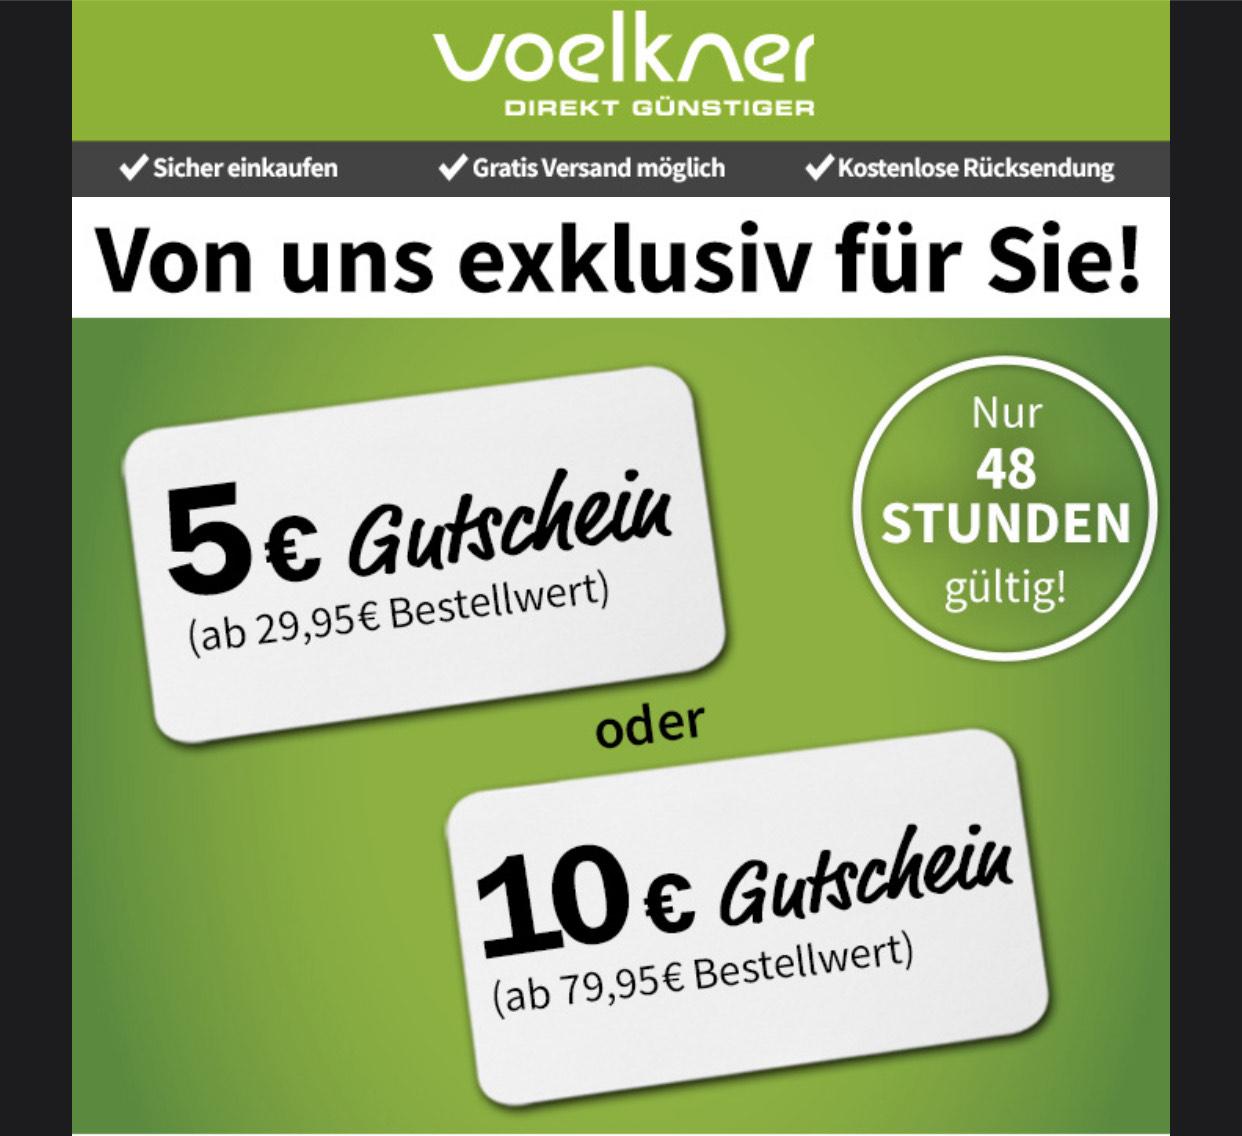 5€ Rabatt ab 29,95€ & 10€ Rabatt ab 79,95€ Bestellwert